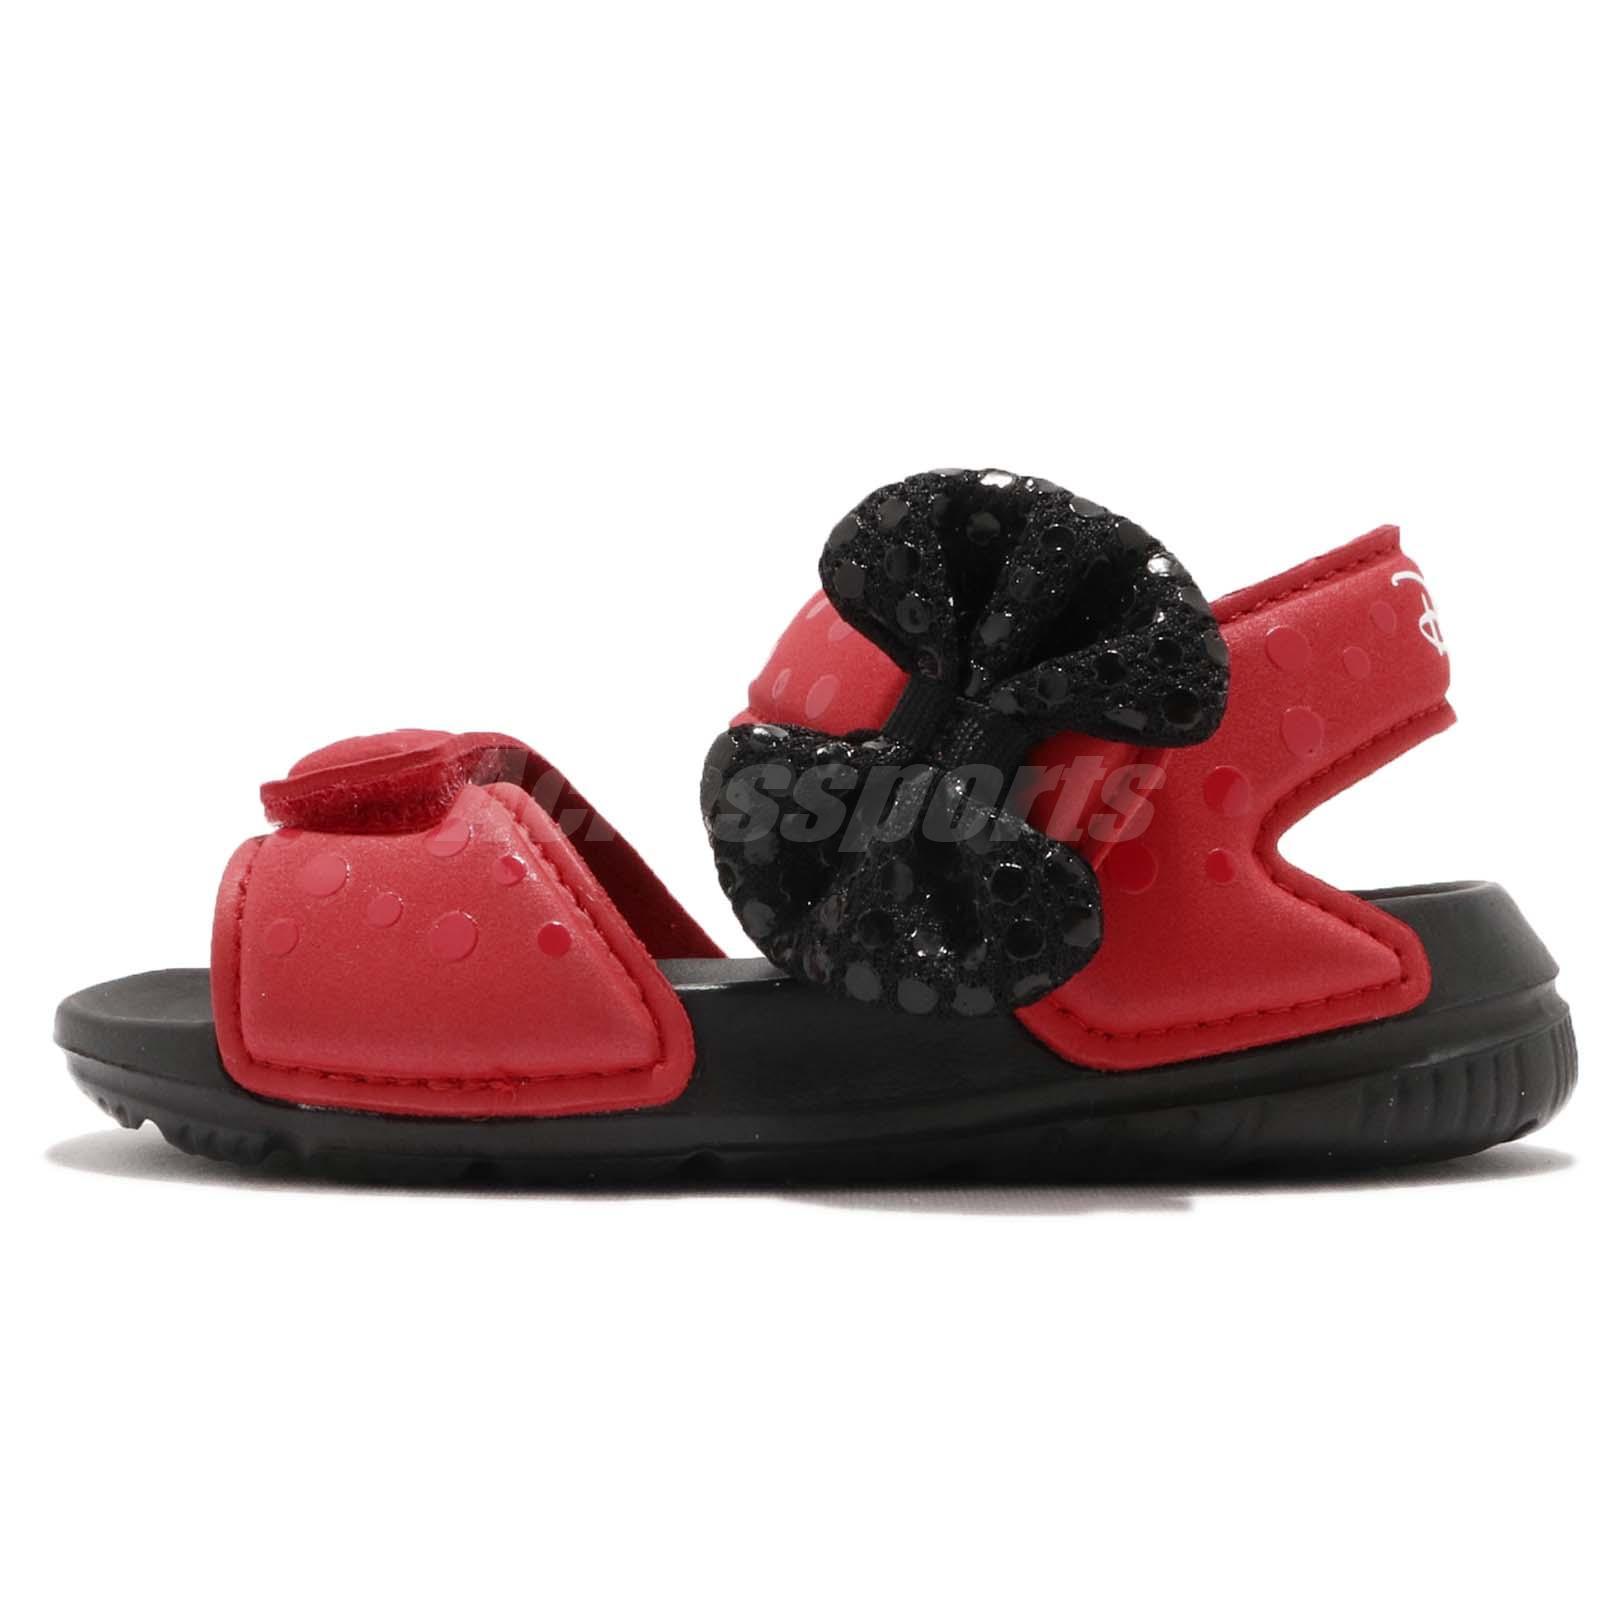 6c25f265bfa6e adidas DY M M AltaSwim I Disney Minnie Mouse Red Infant Toddler Sandal  CQ0108